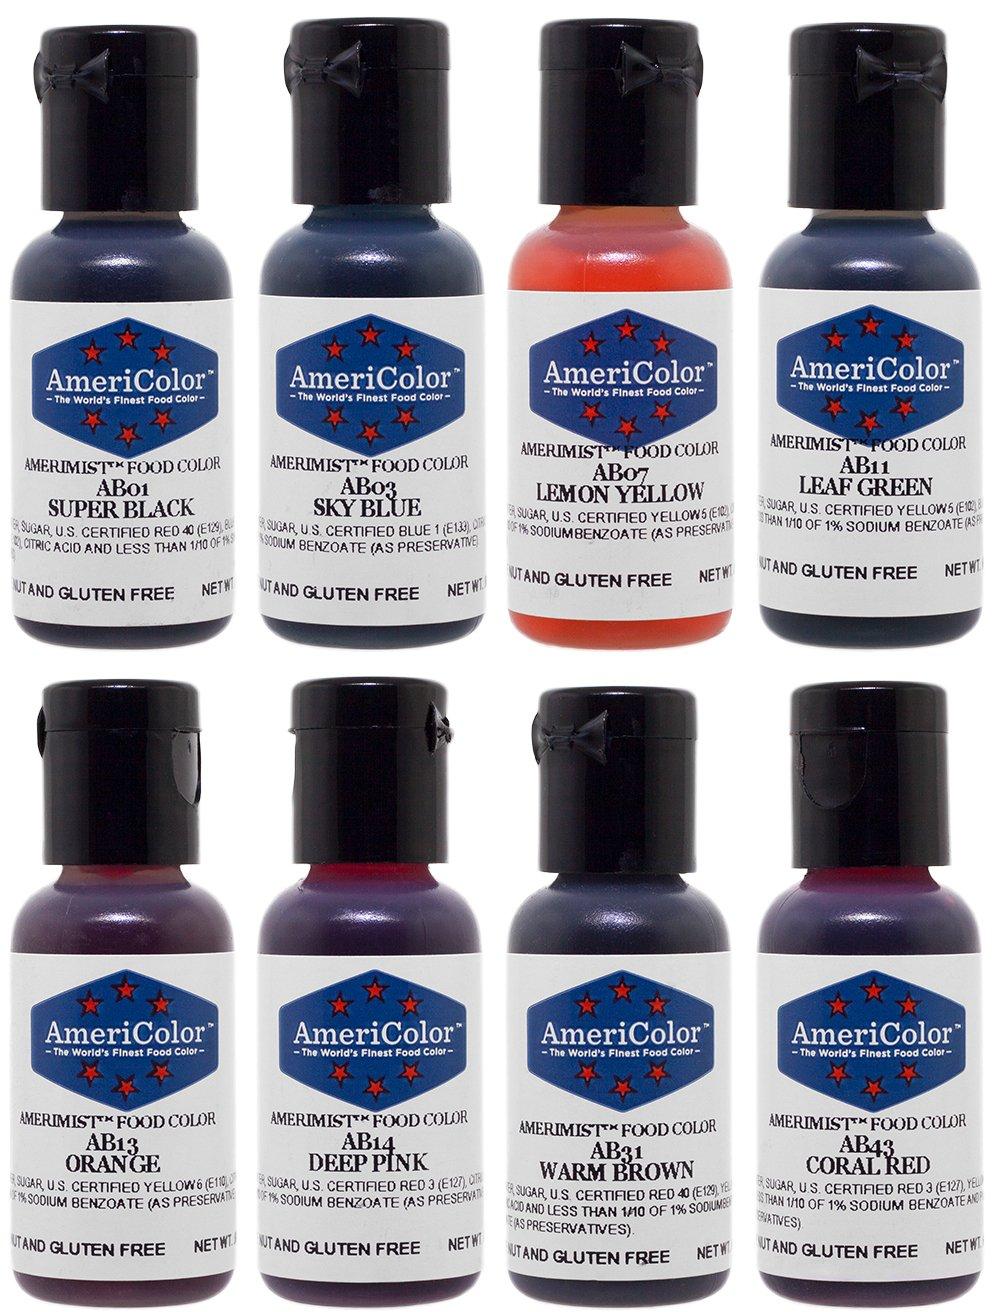 AmeriColor AmeriMist 8 Color Airbrush Food Color Kit AmeriColor Corp.